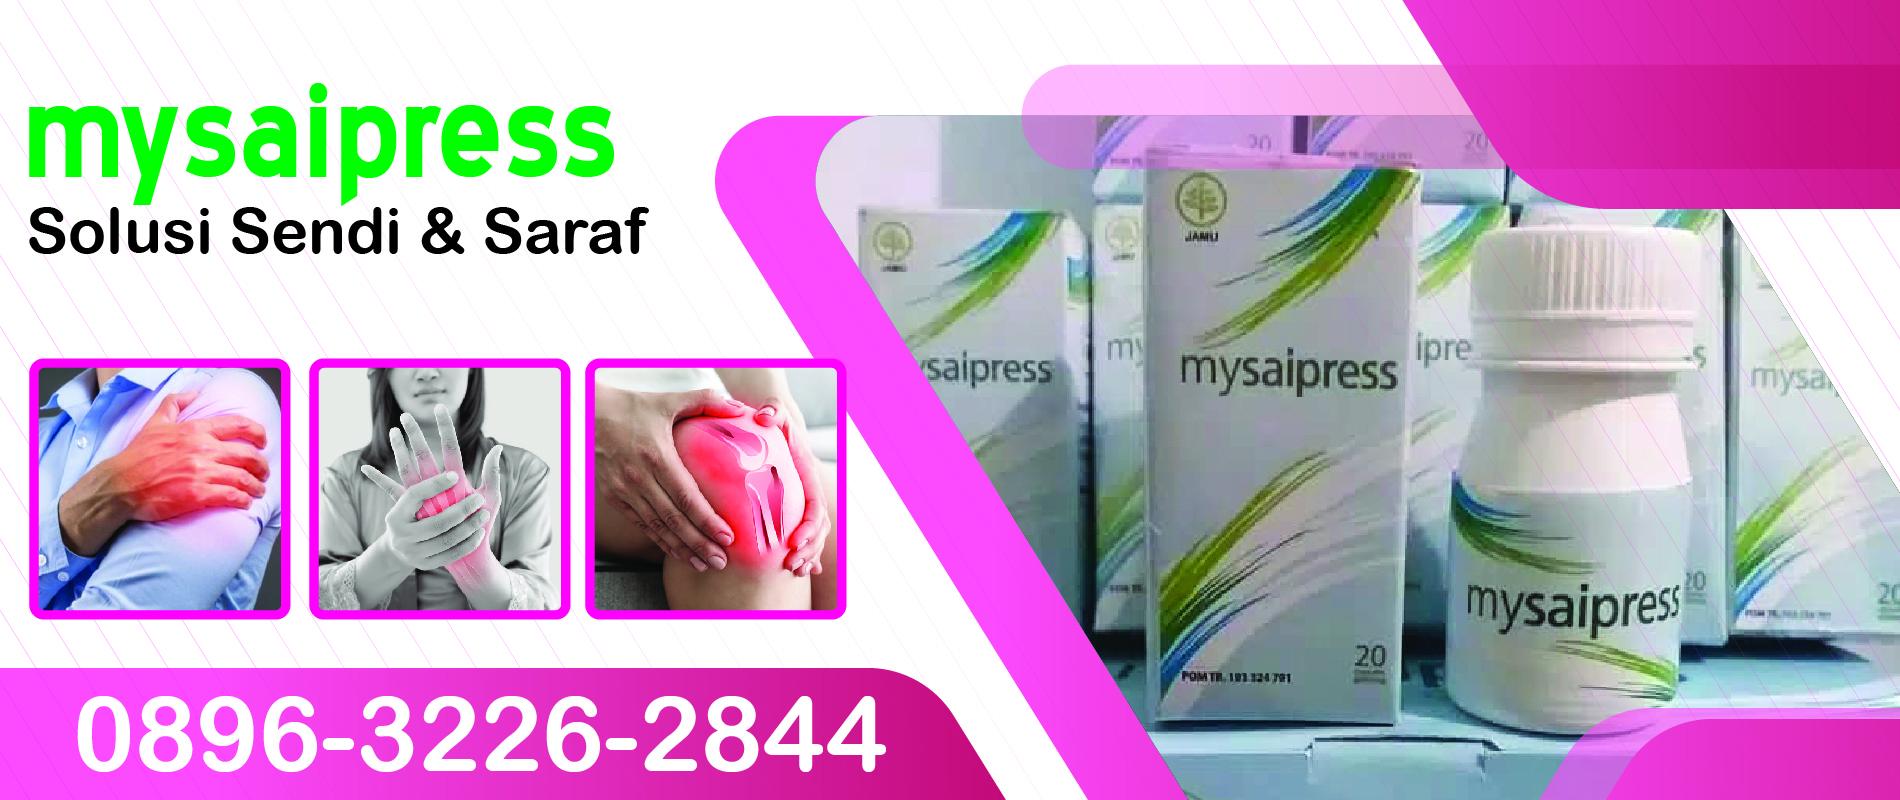 Produk Mysaipress-01